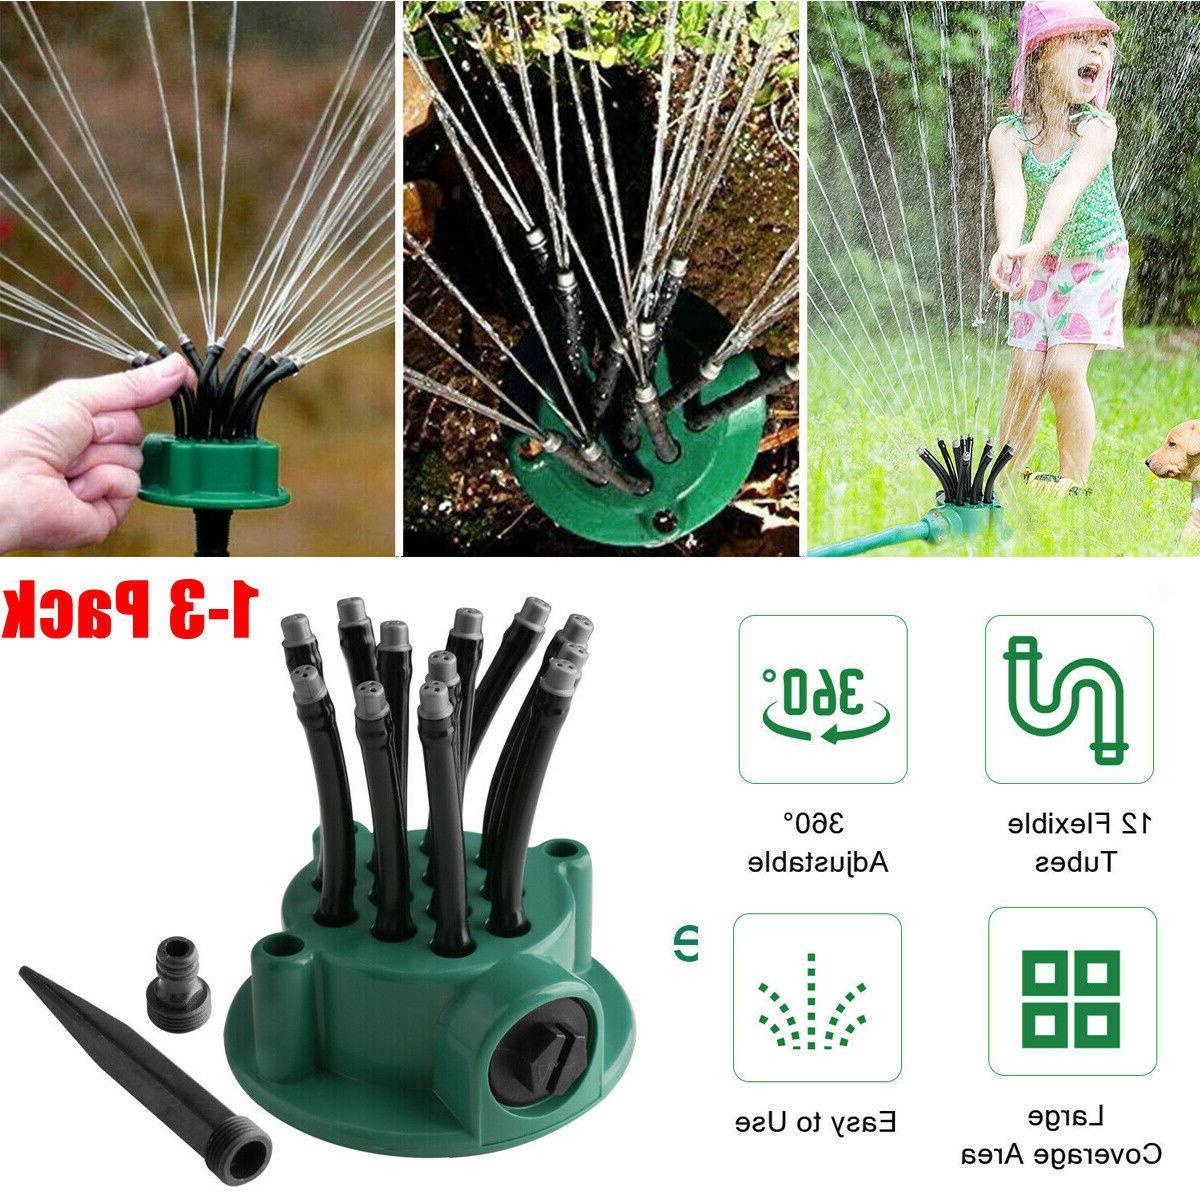 360 automatic rotating lawn sprinkler garden grass